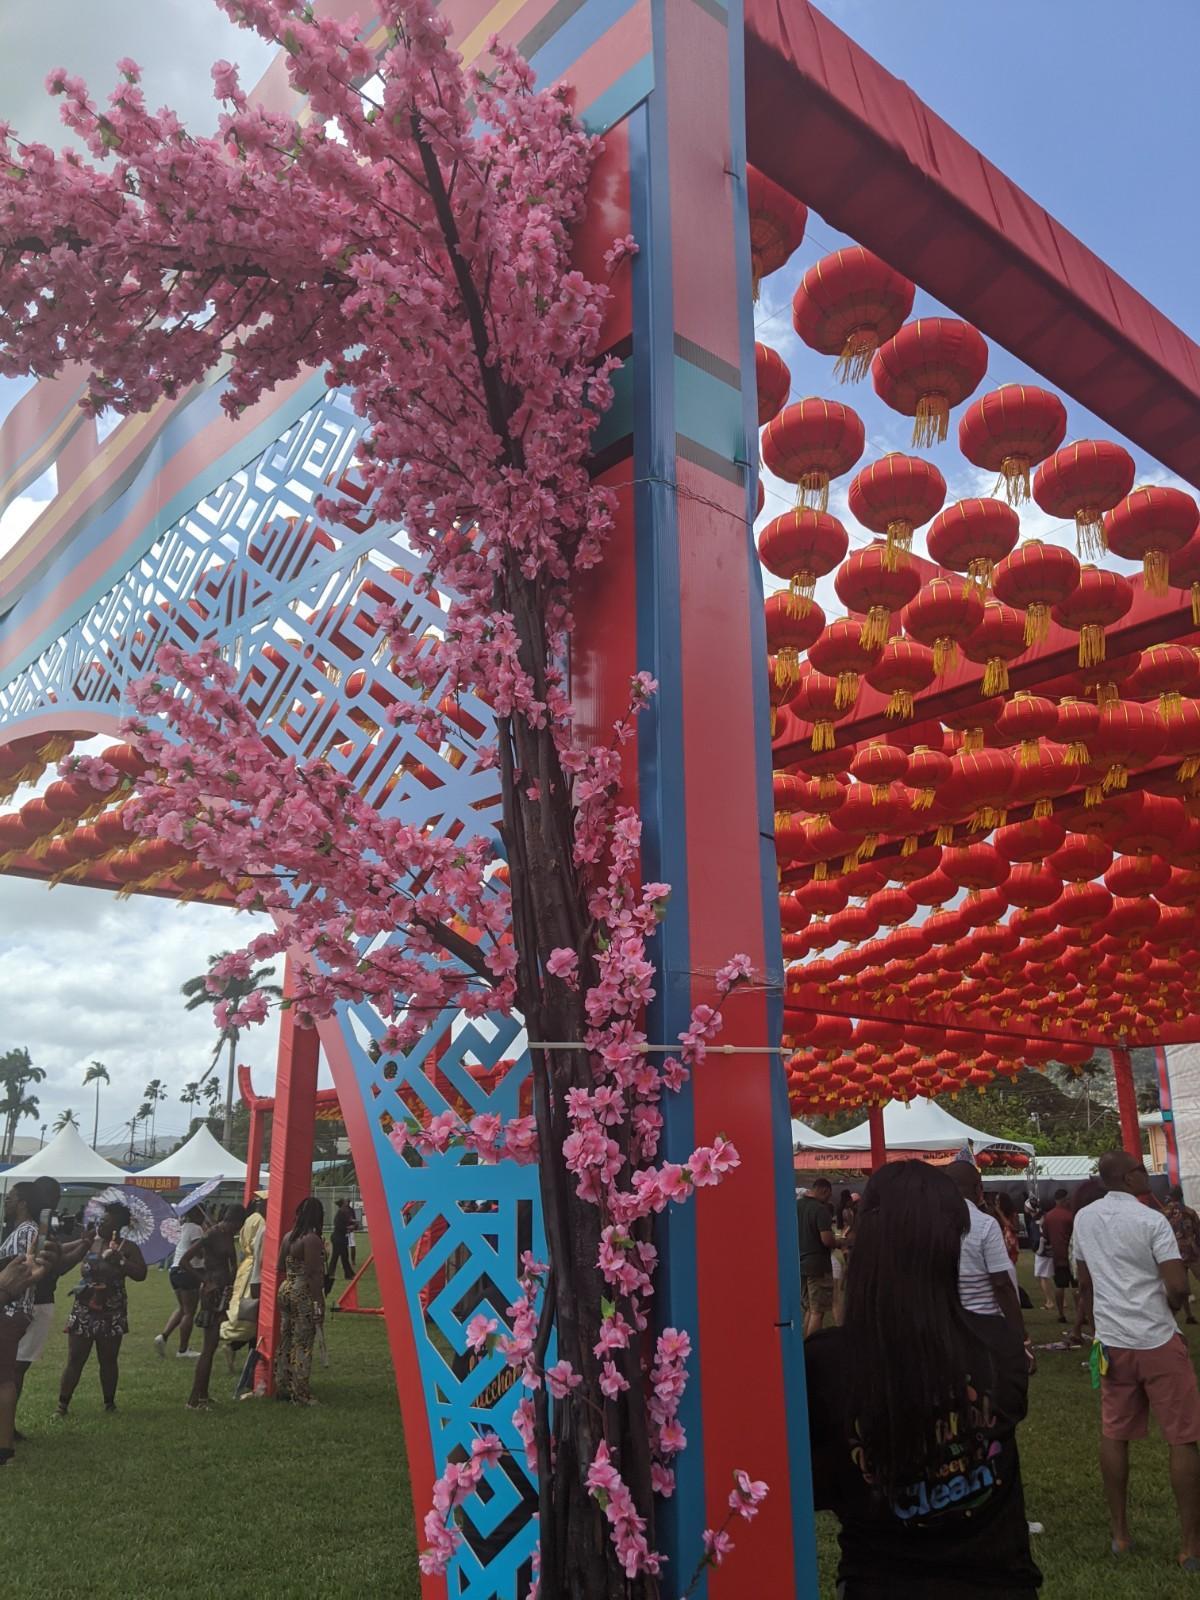 Soca Brainwash Trinidad Carnival 2020